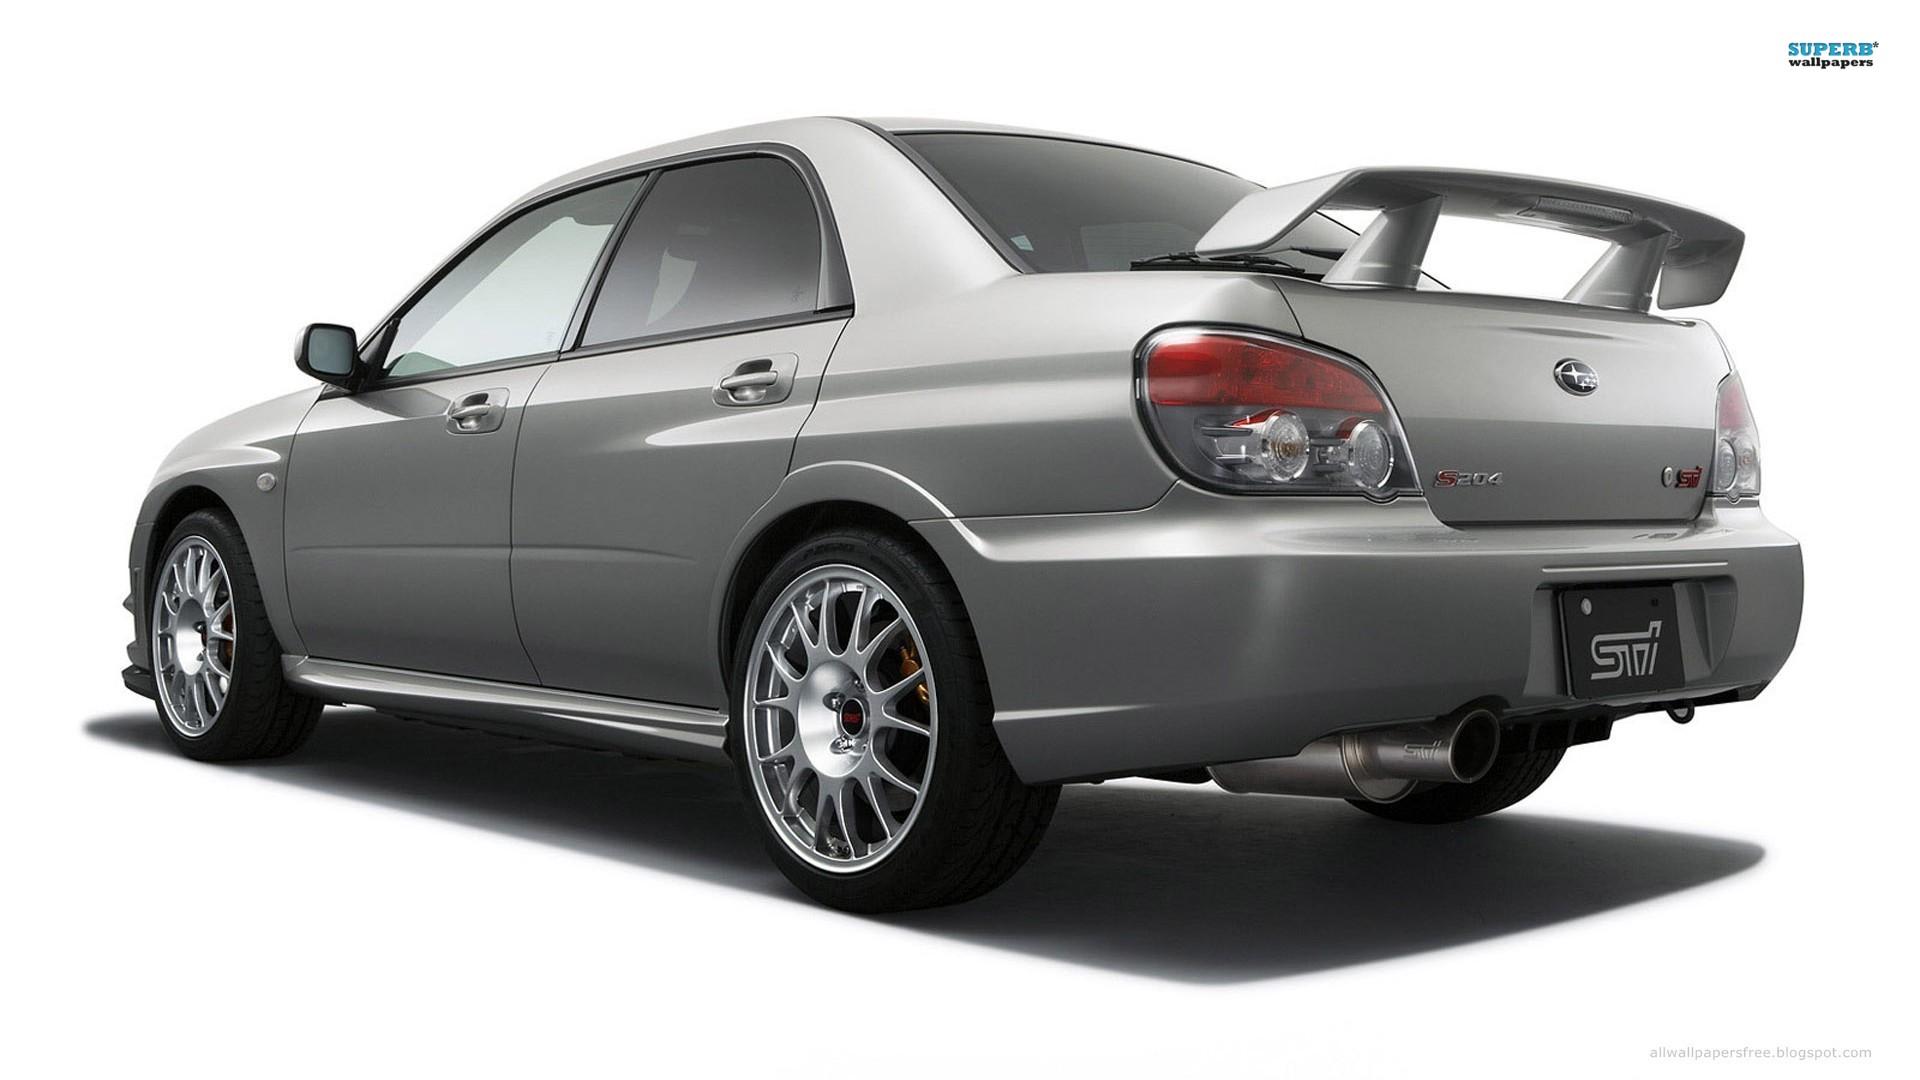 3dtuning Of Subaru Impreza S204 Sedan 2006 3dtuning Com